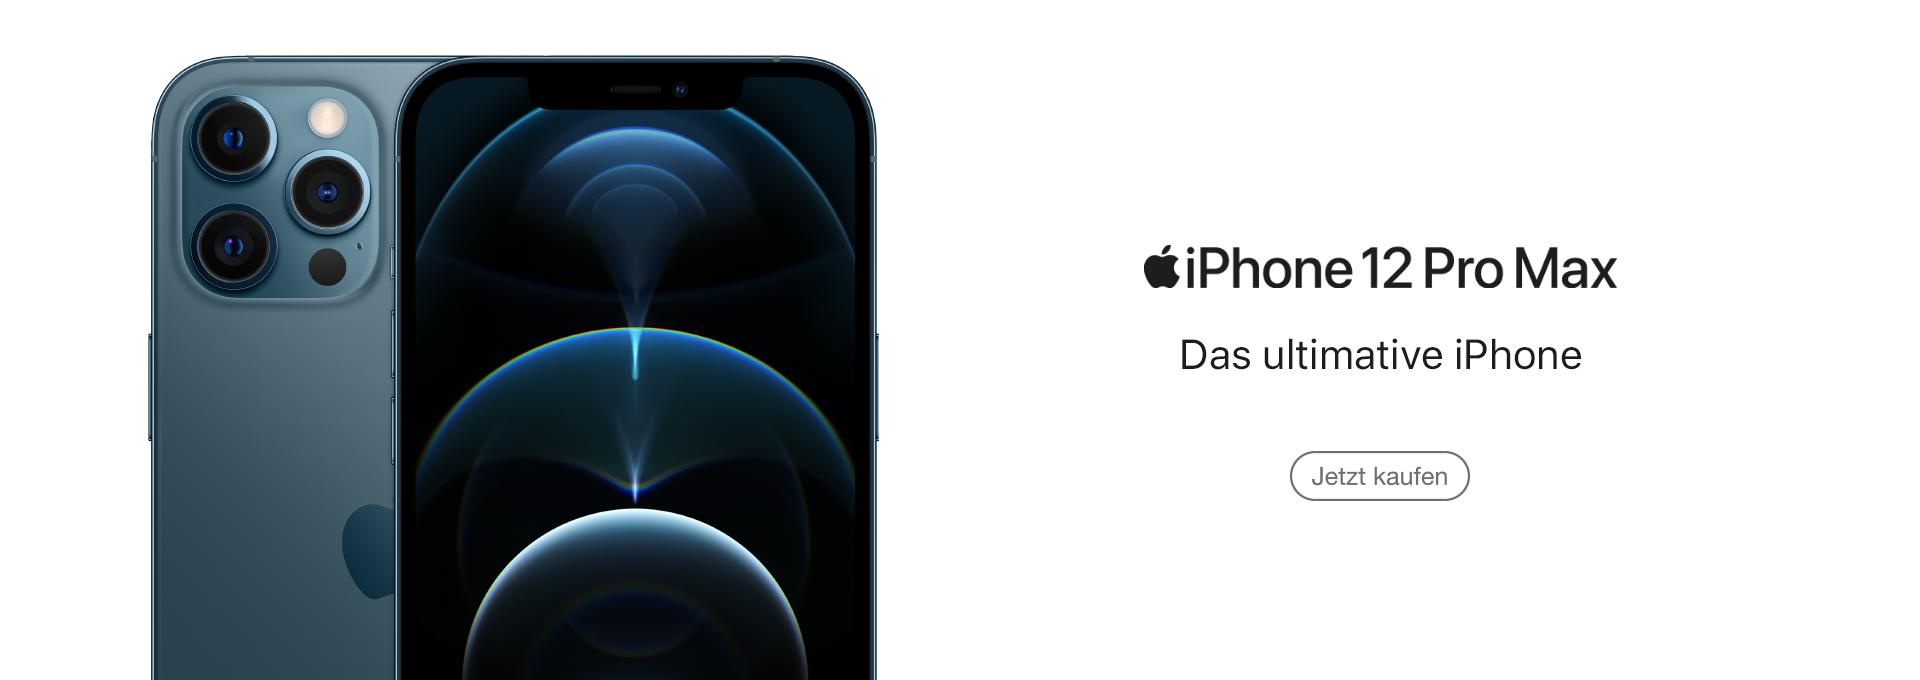 Jetzt Apple iPhone Pro Max kaufen